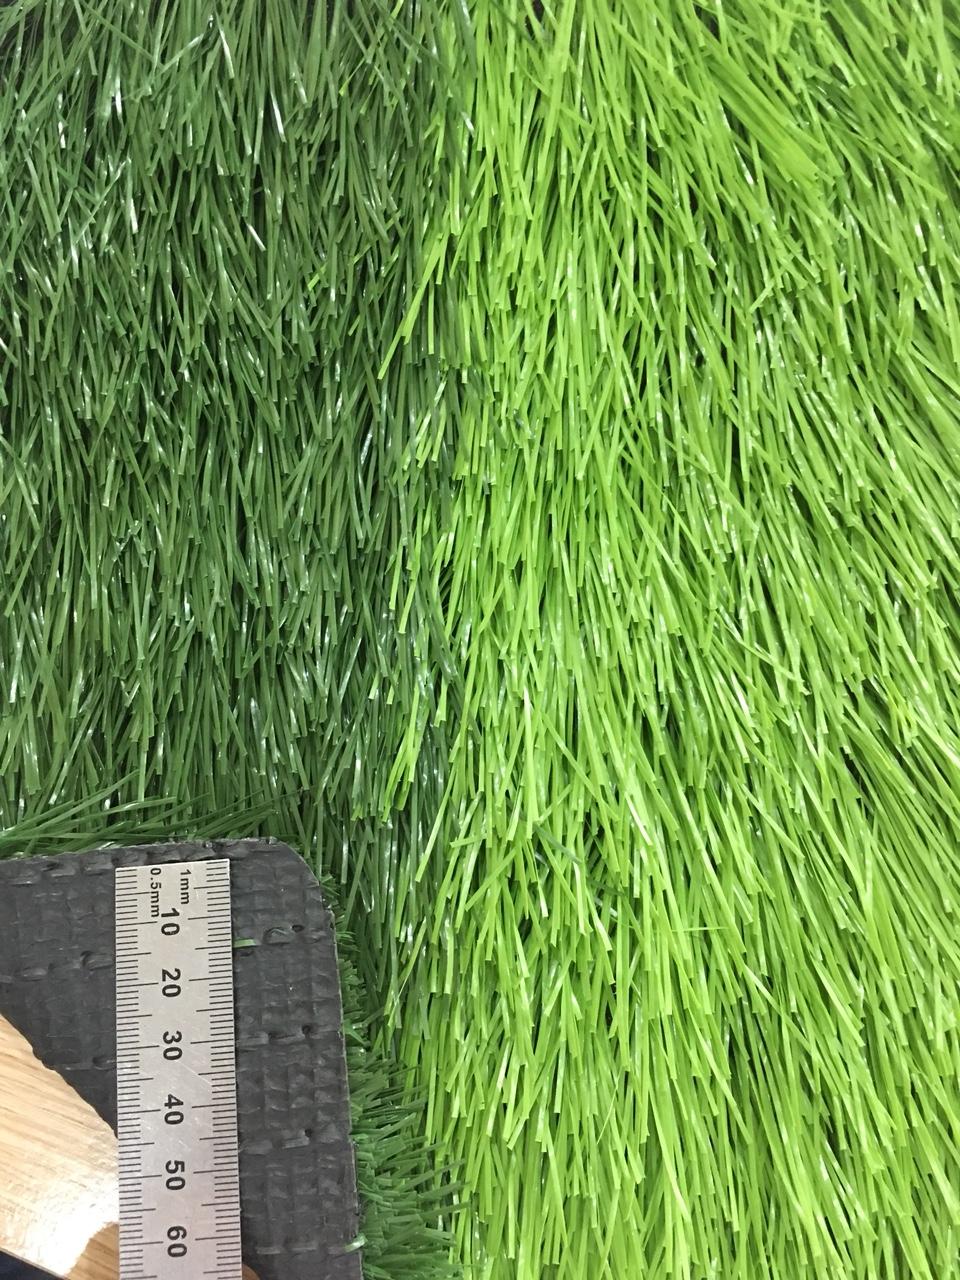 Co nhan tao AF-C350416GD08801 _XT8Xh → Công ty AFD grass